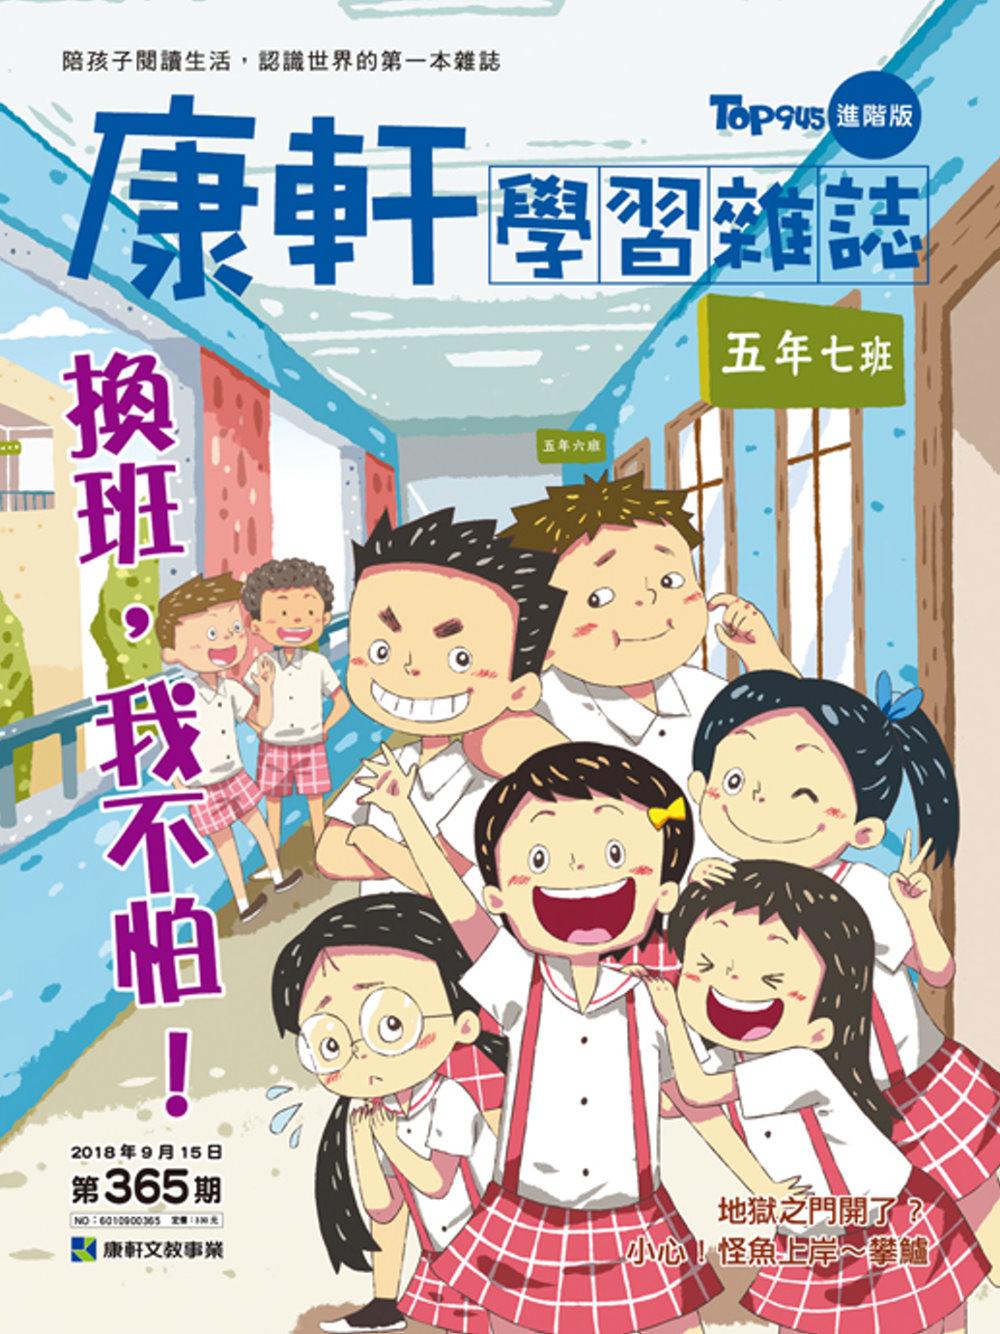 Top945康軒學習雜誌進階版 2018/9/15第365期